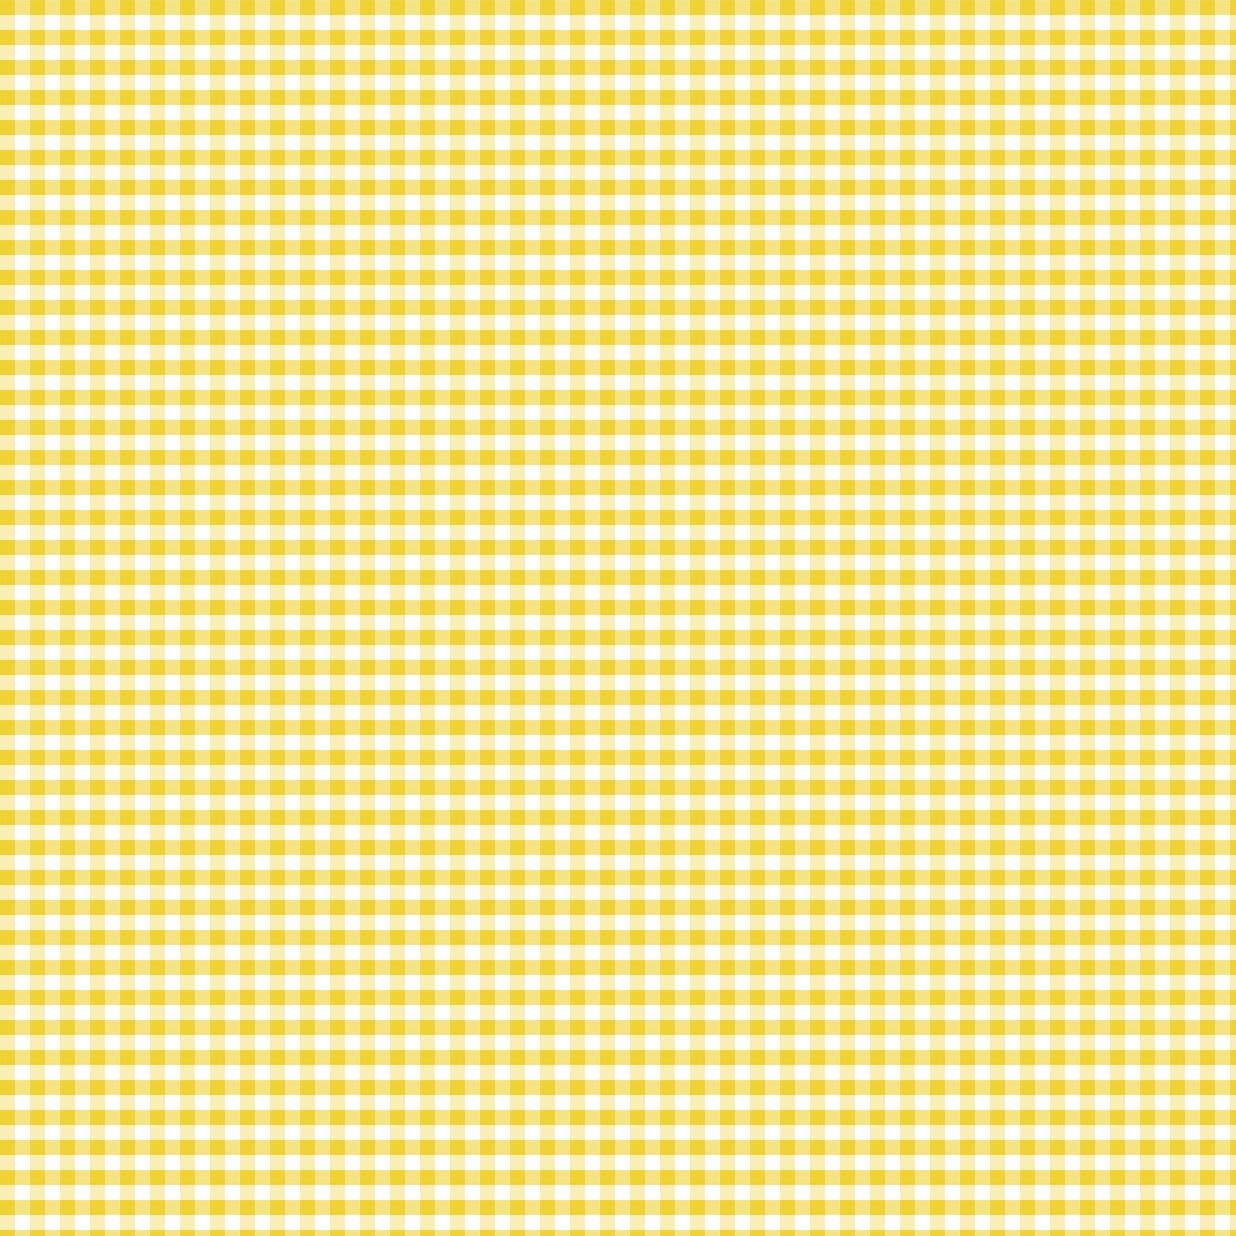 Coton vichy jaune 5 mm